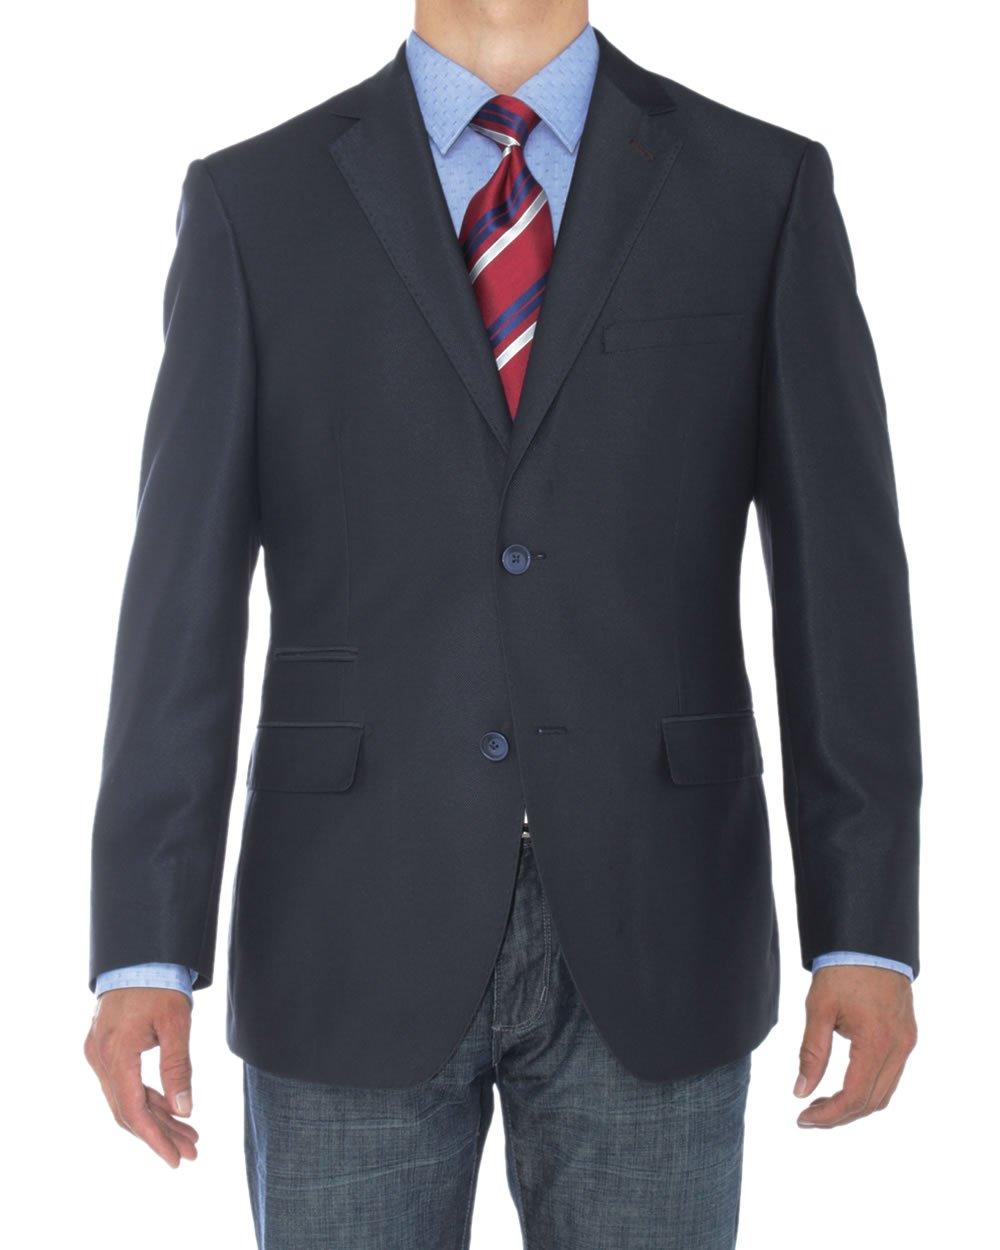 Luciano Natazzi Mens Two Button Notch Lapel Blazer Modern Fit Suit Jacket (54 Long US / 64 Long EU, Blue)